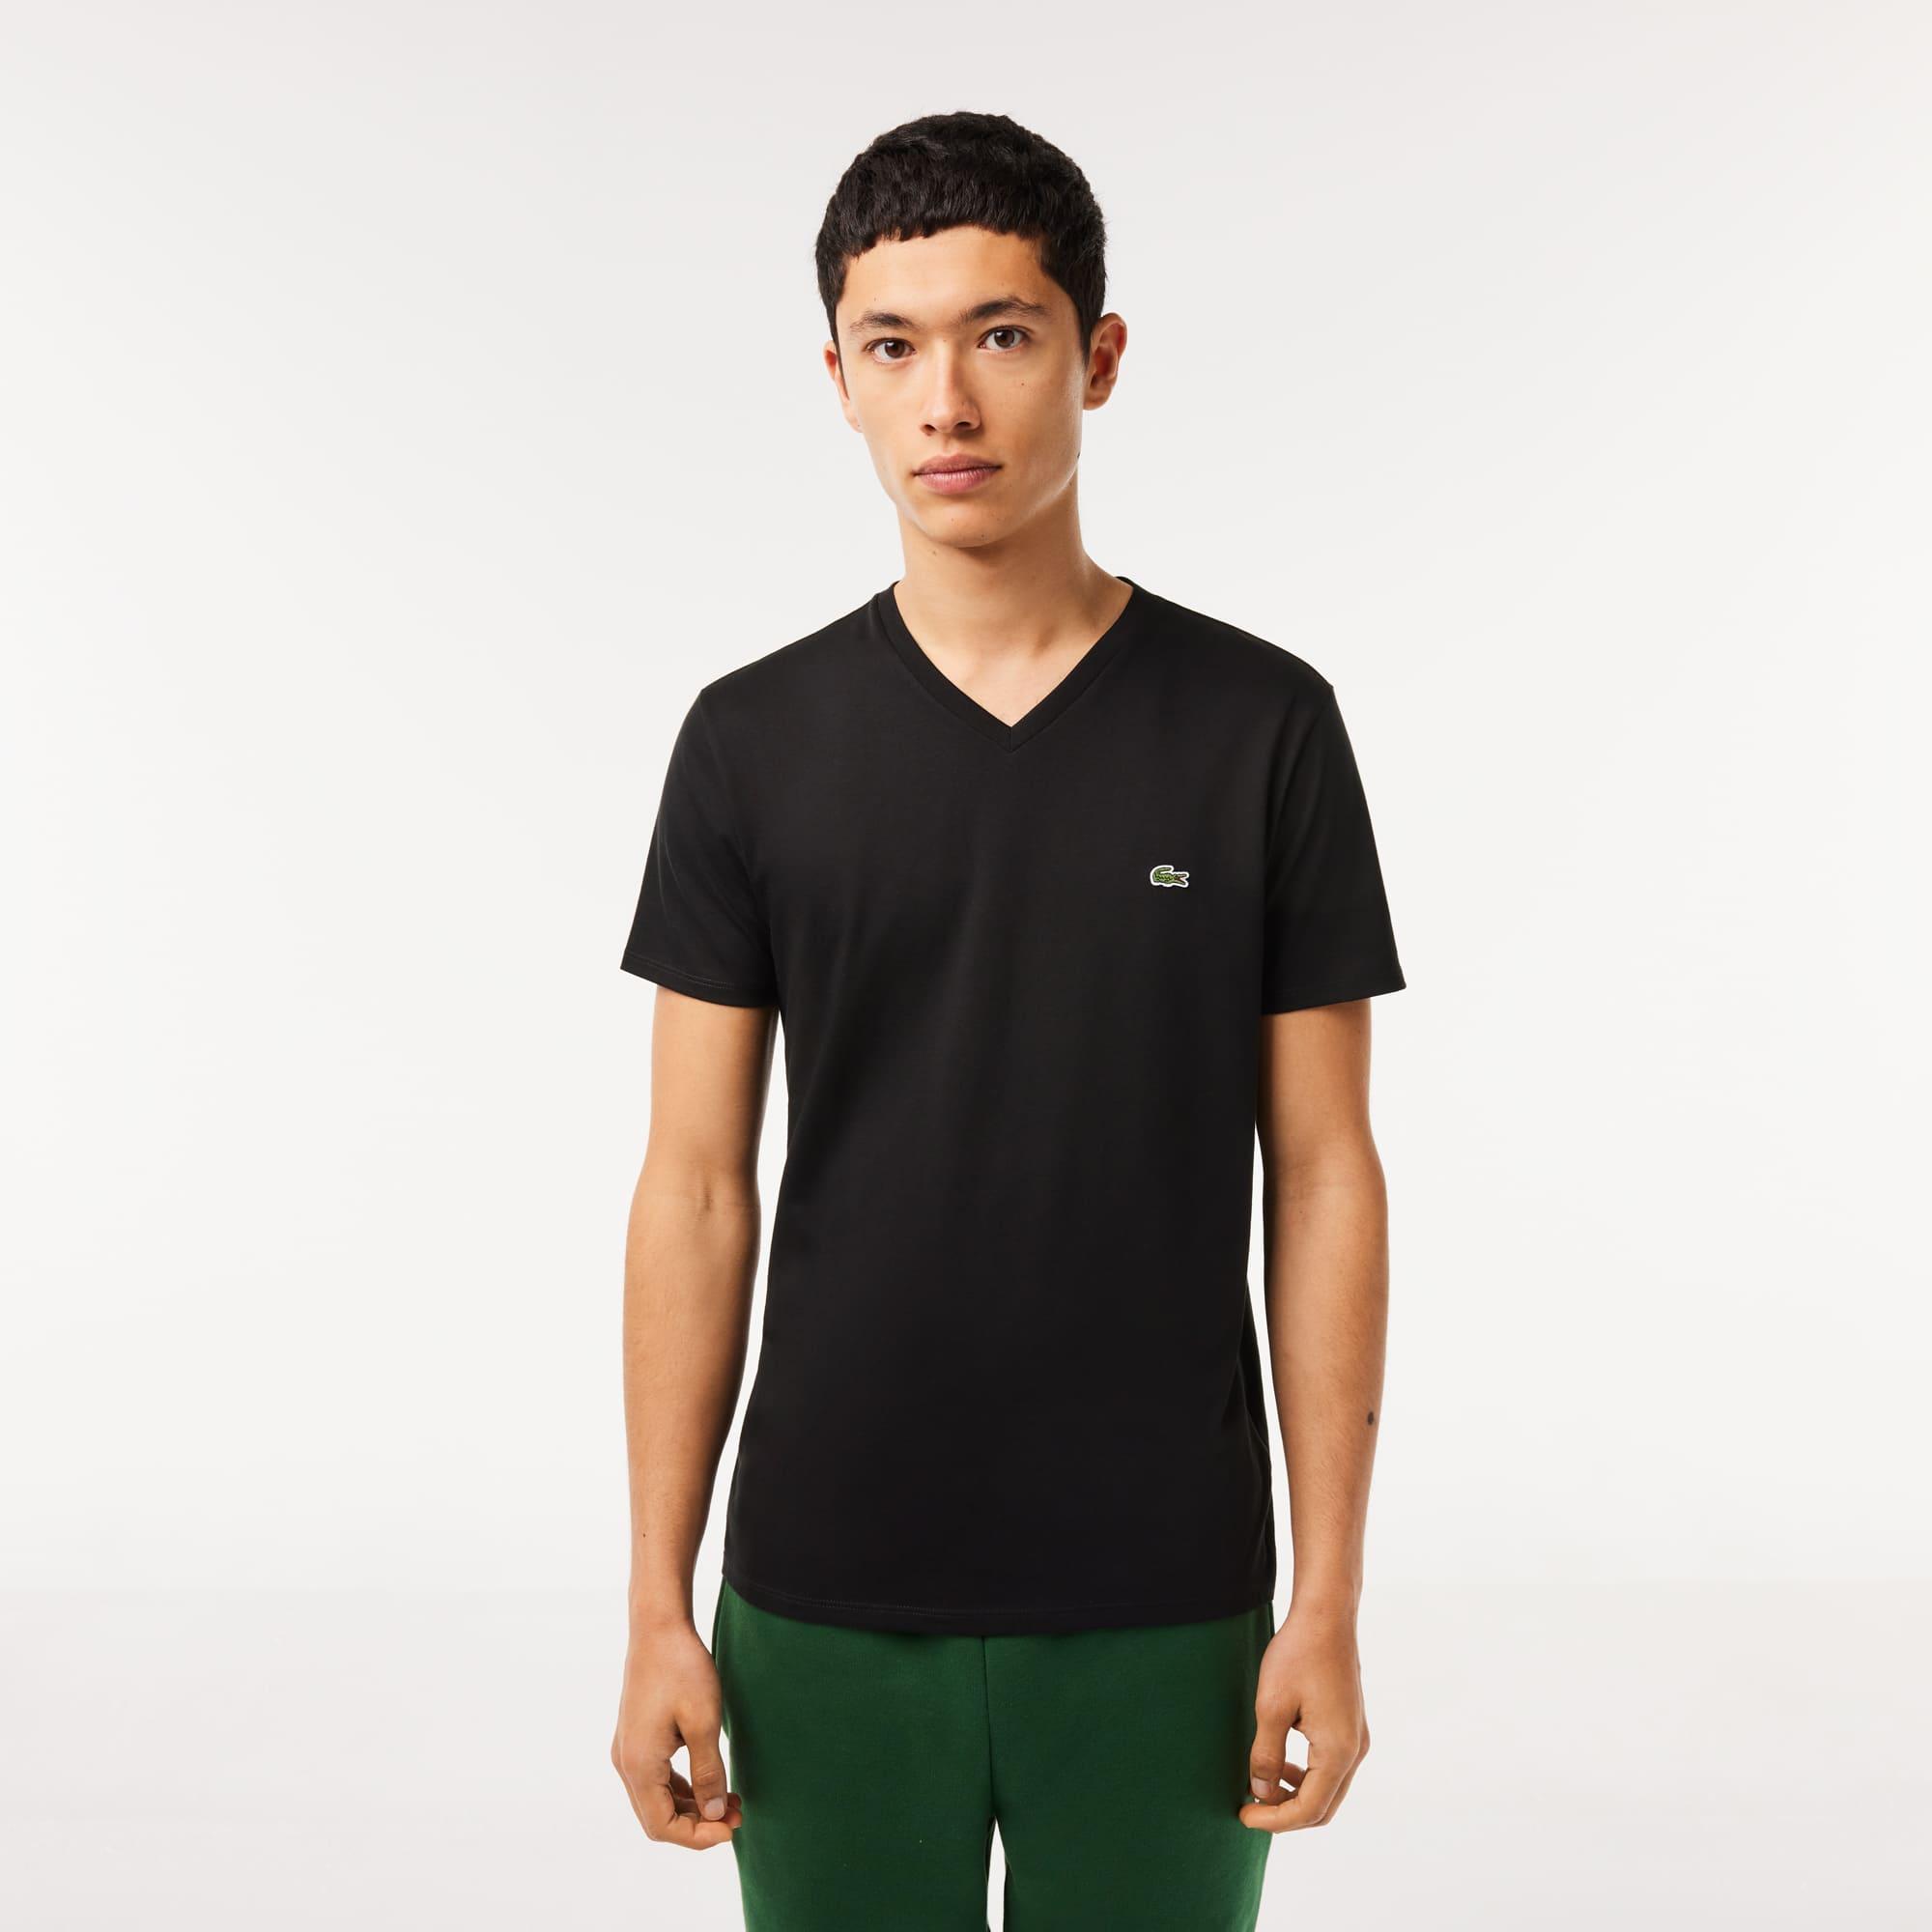 Camisetas   Moda Masculina   LACOSTE c2e67196ab